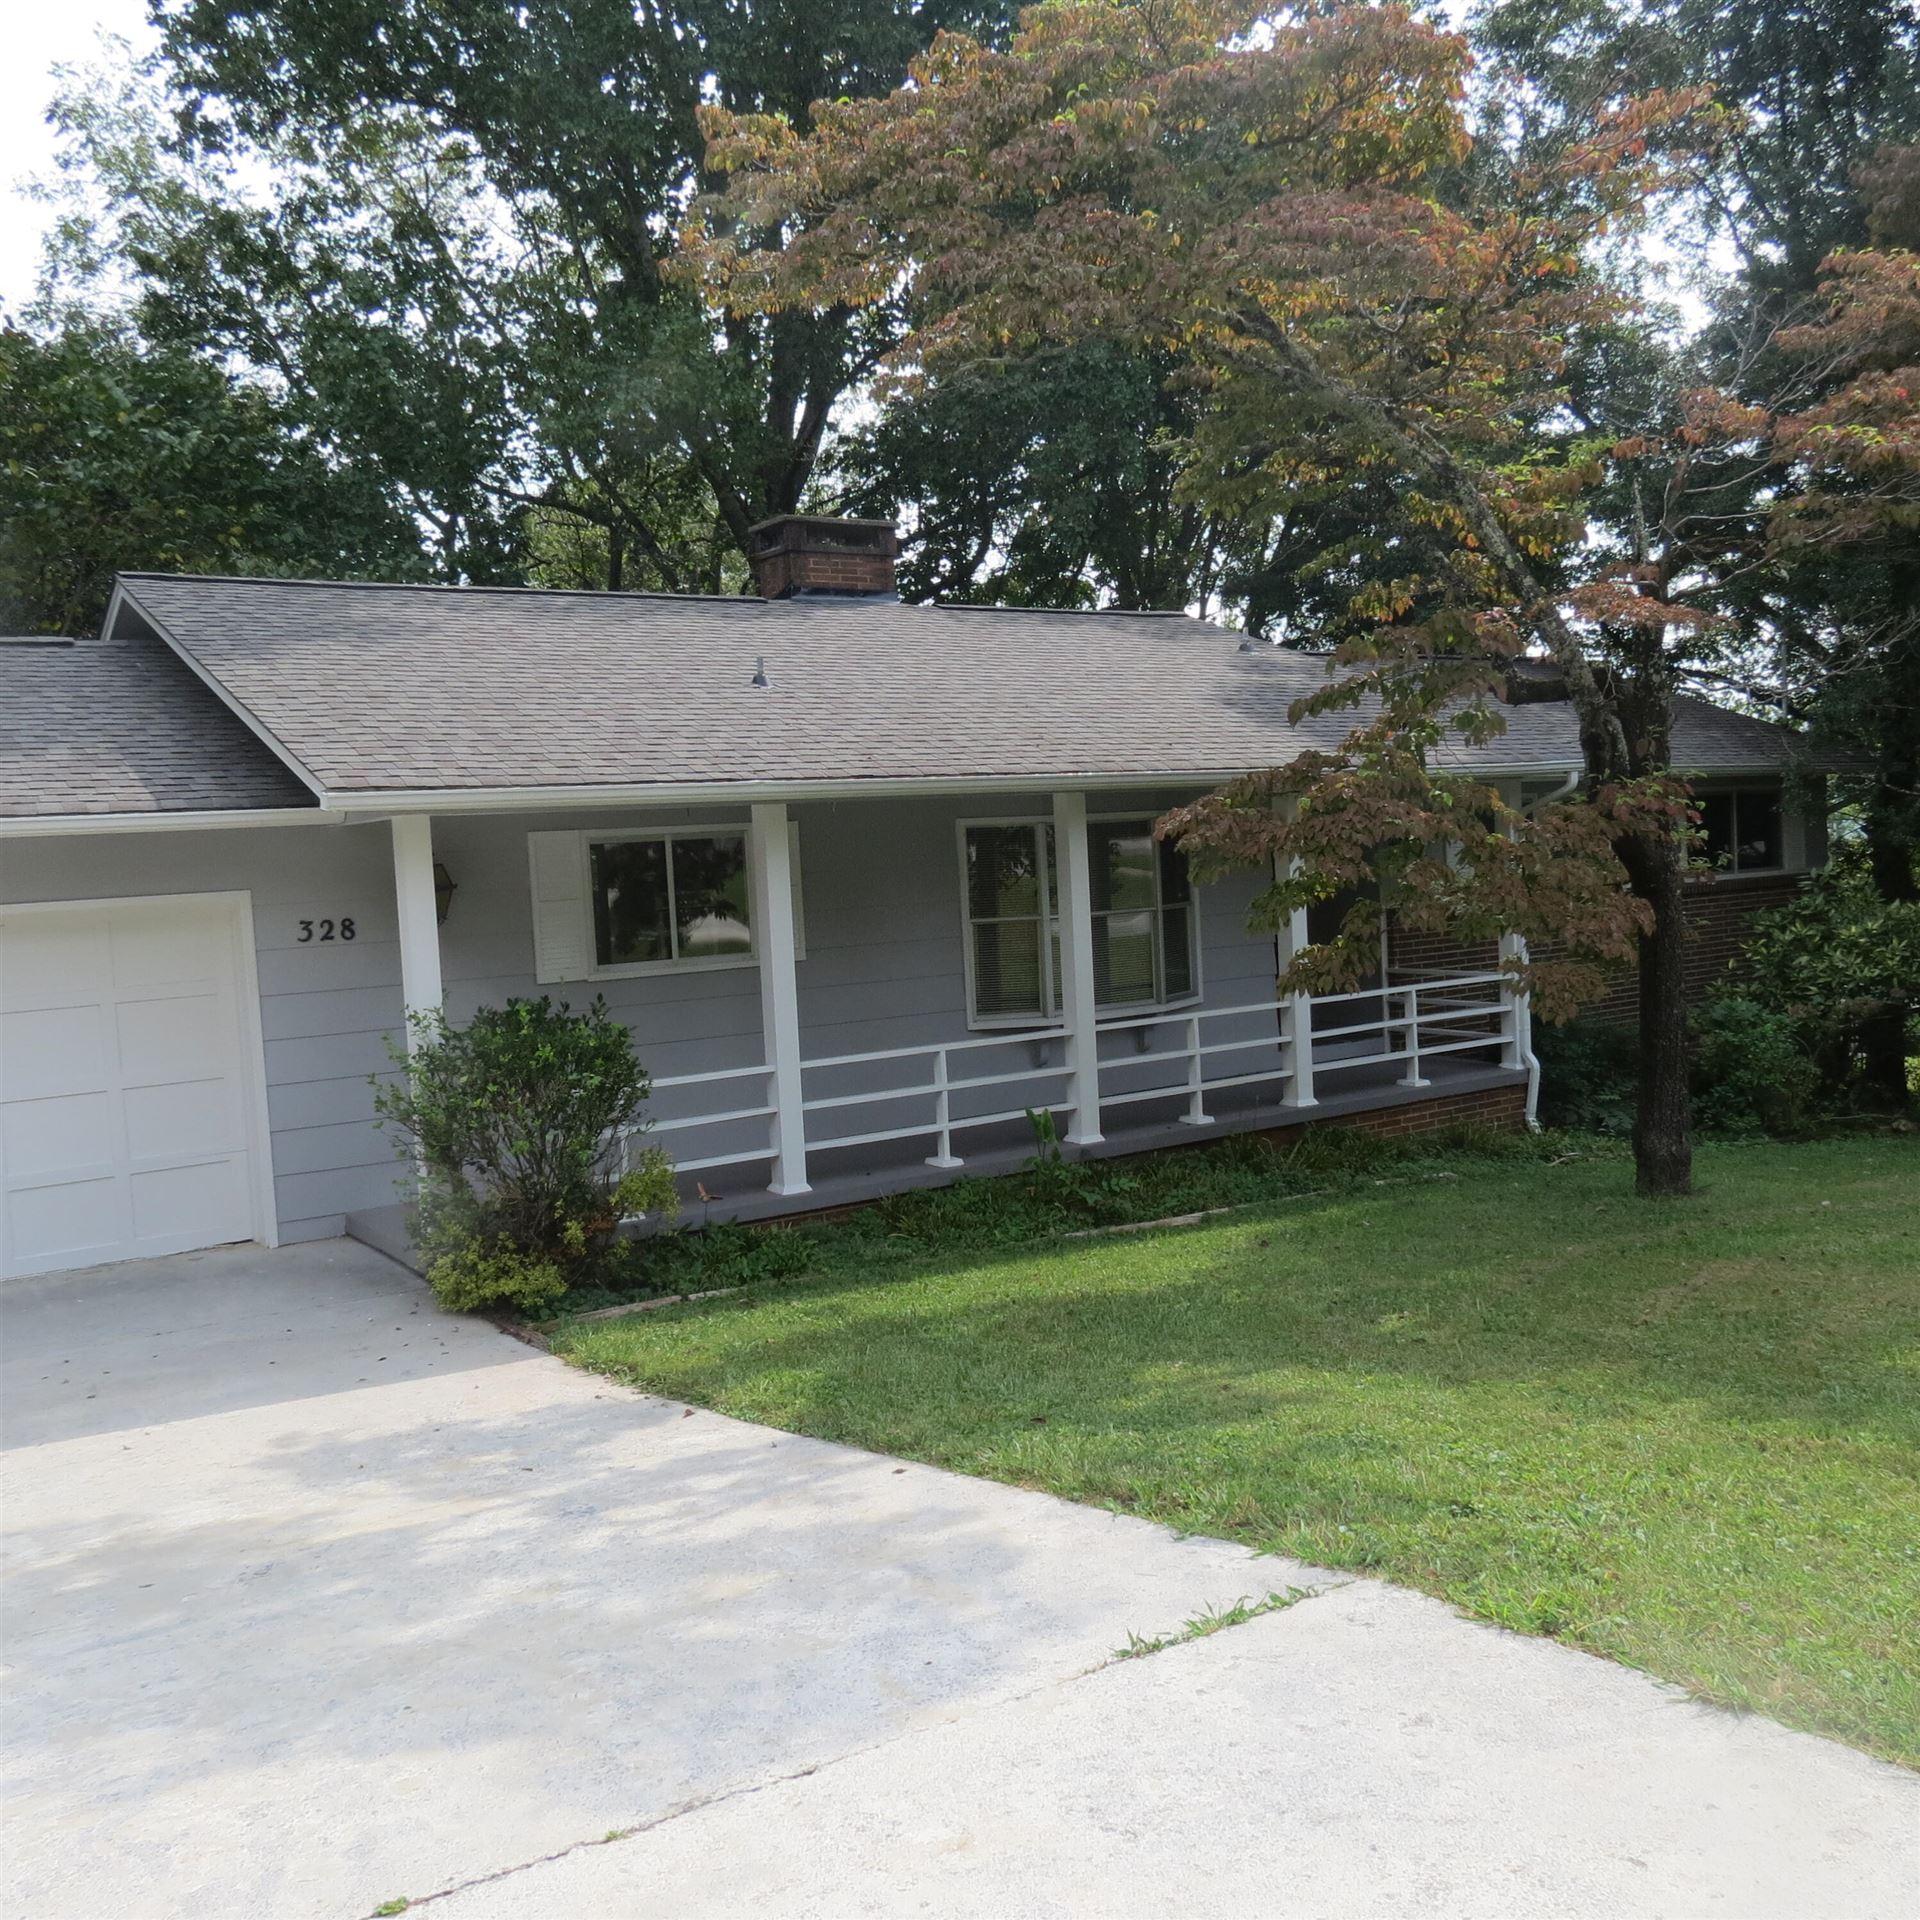 Photo of 328 Louisiana Ave, Oak Ridge, TN 37830 (MLS # 1167703)